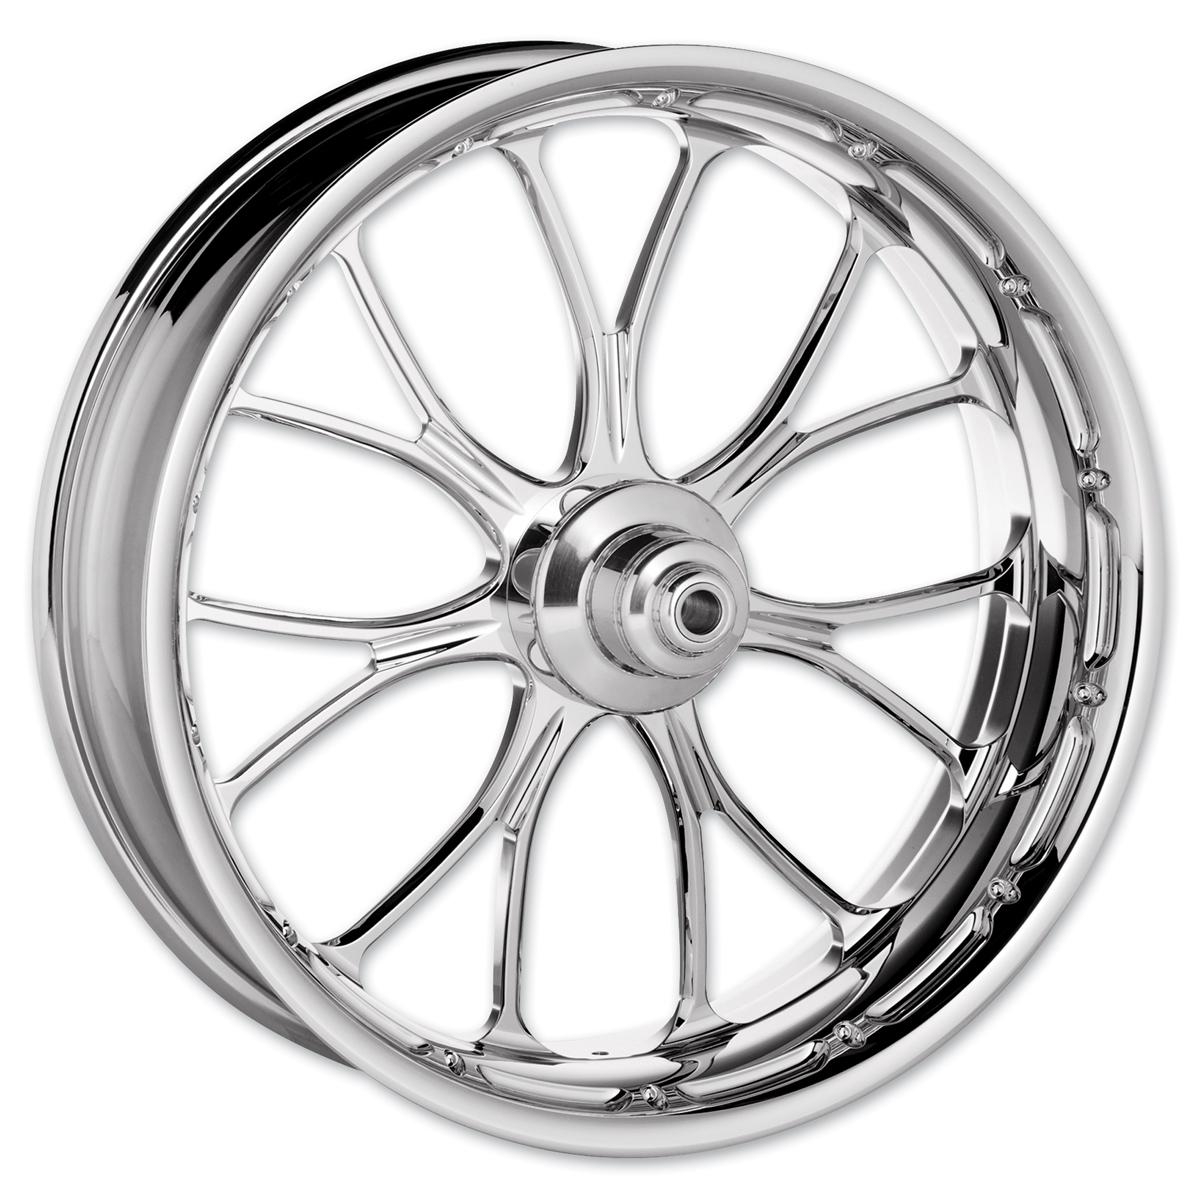 Performance Machine Heathen Chrome Rear Wheel 18x5.5 Non-ABS